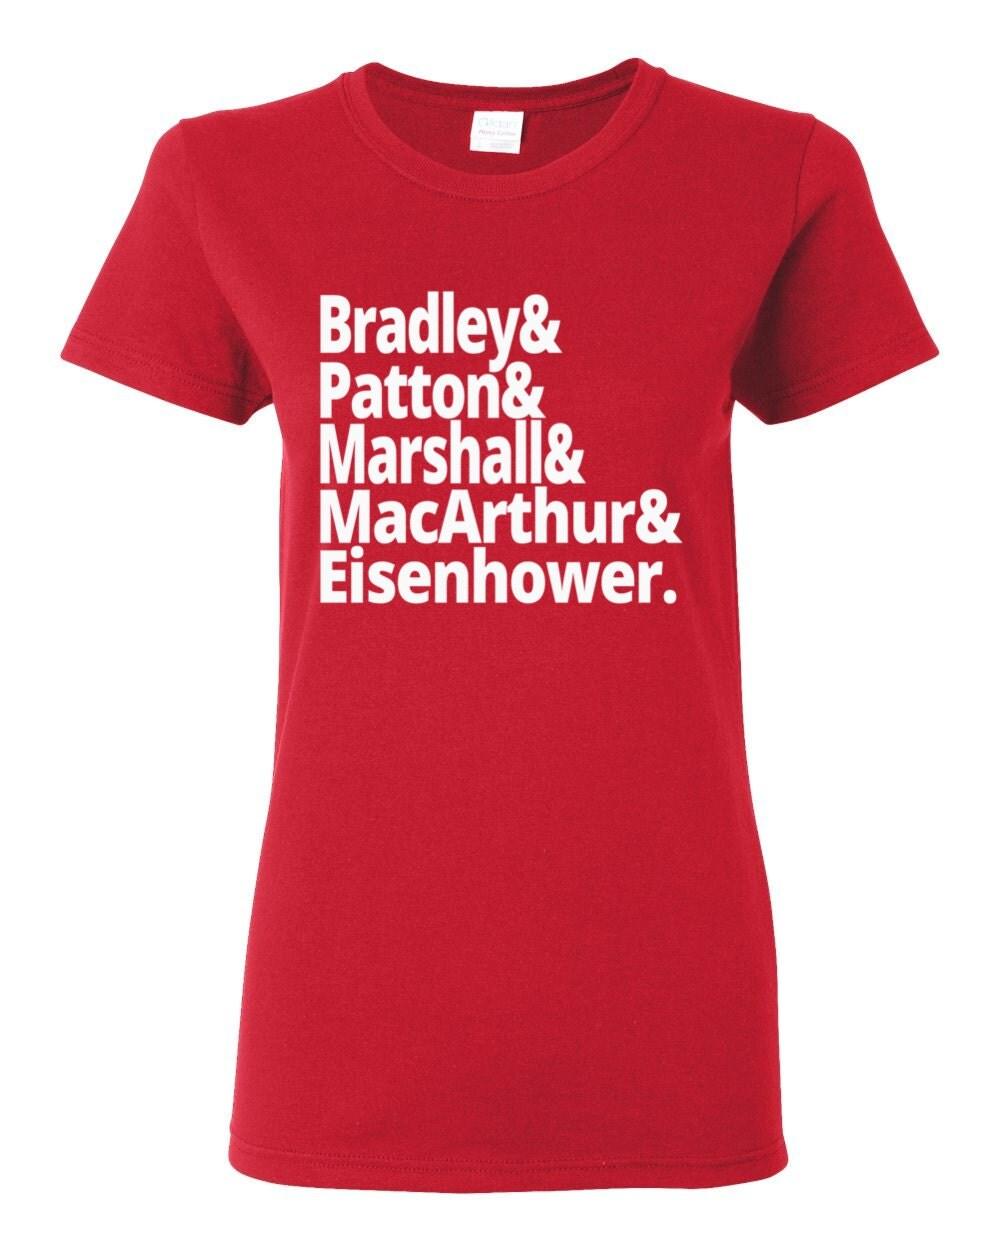 US History - World War II Generals - Bradley, Patton, Marshall, MacArthur and Eisenhower - US History T-shirt